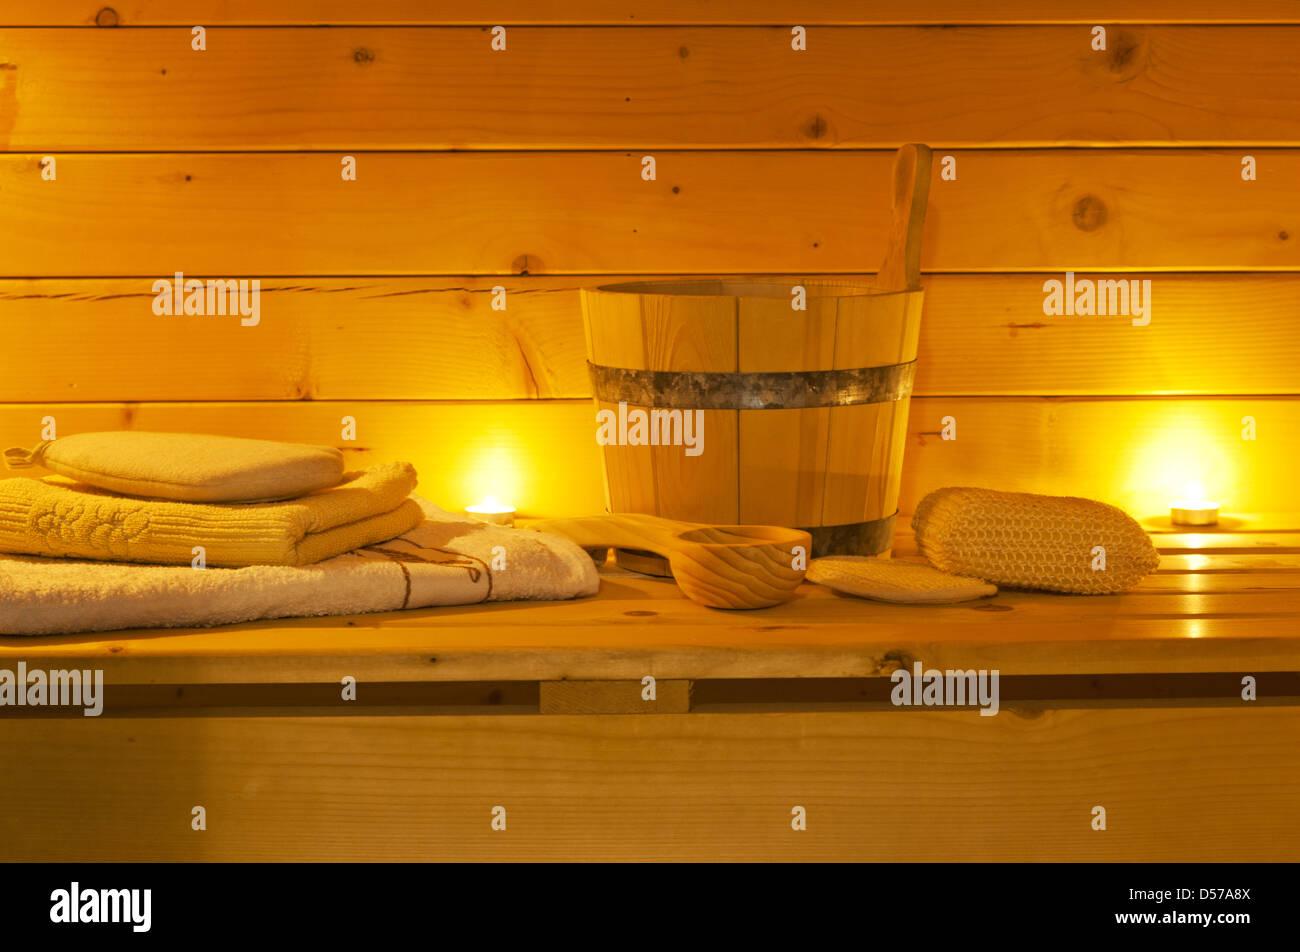 interior of sauna and sauna accessories - Stock Image